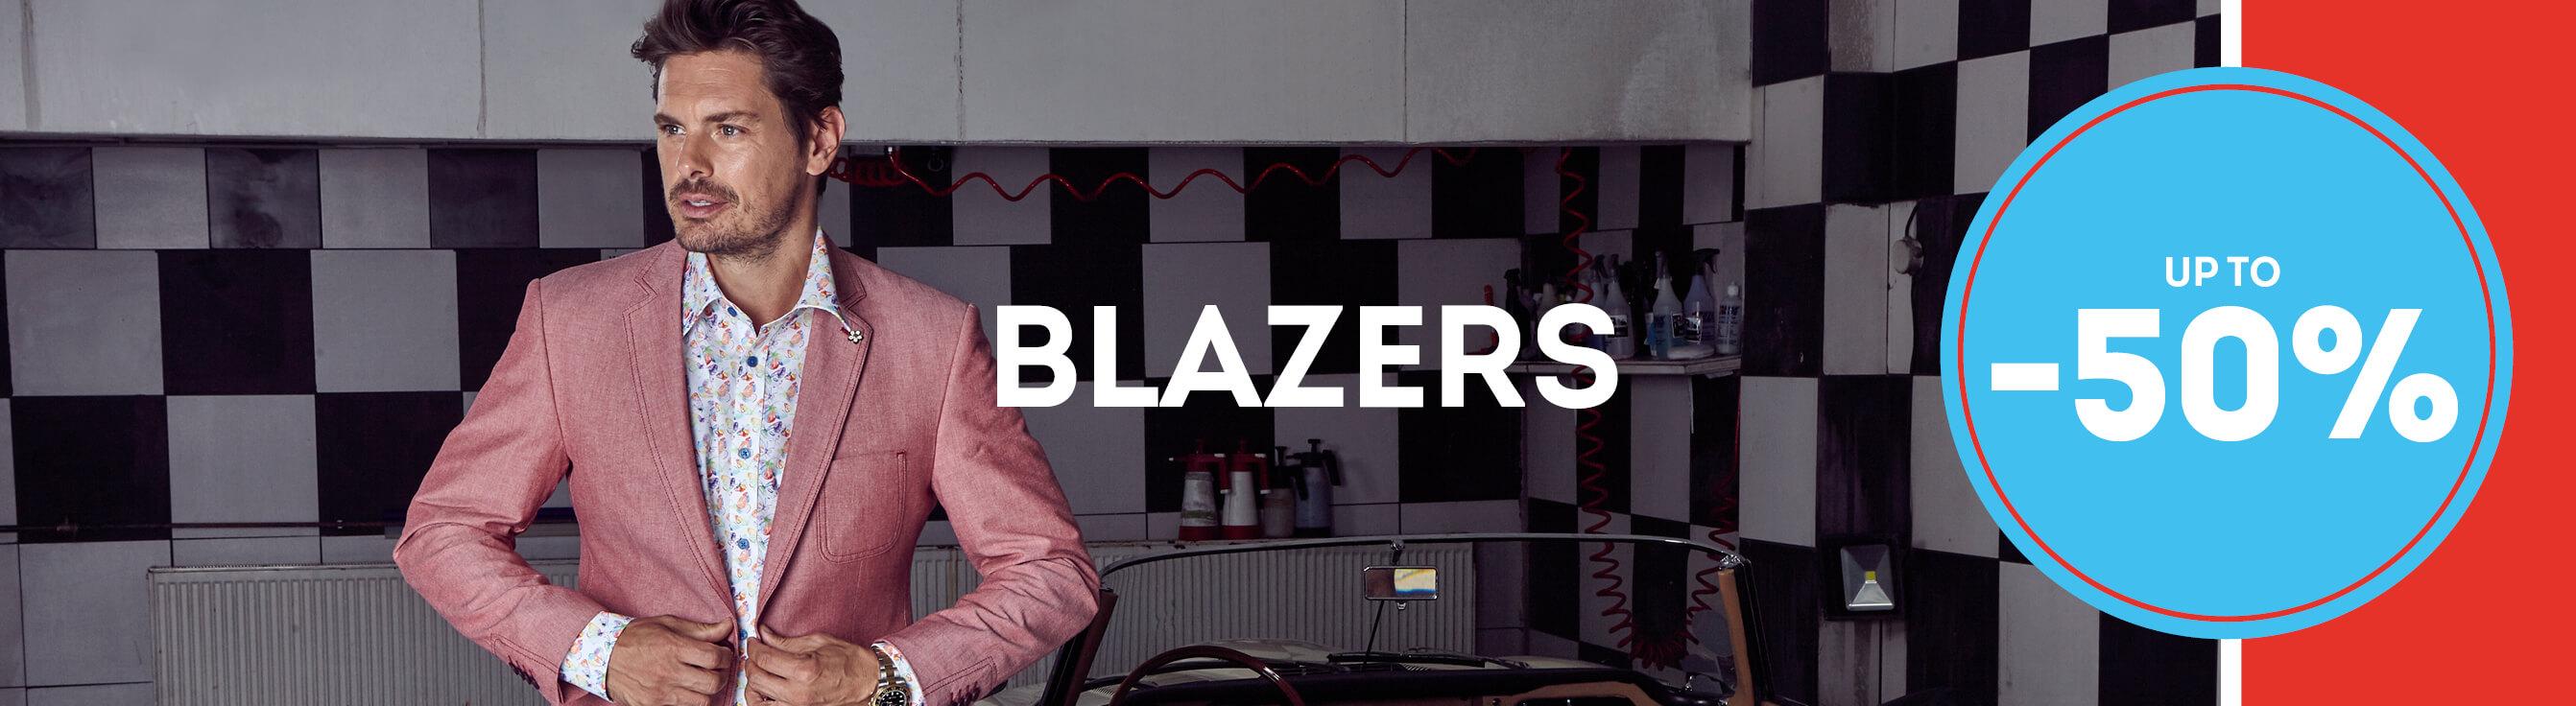 Blazers SALE